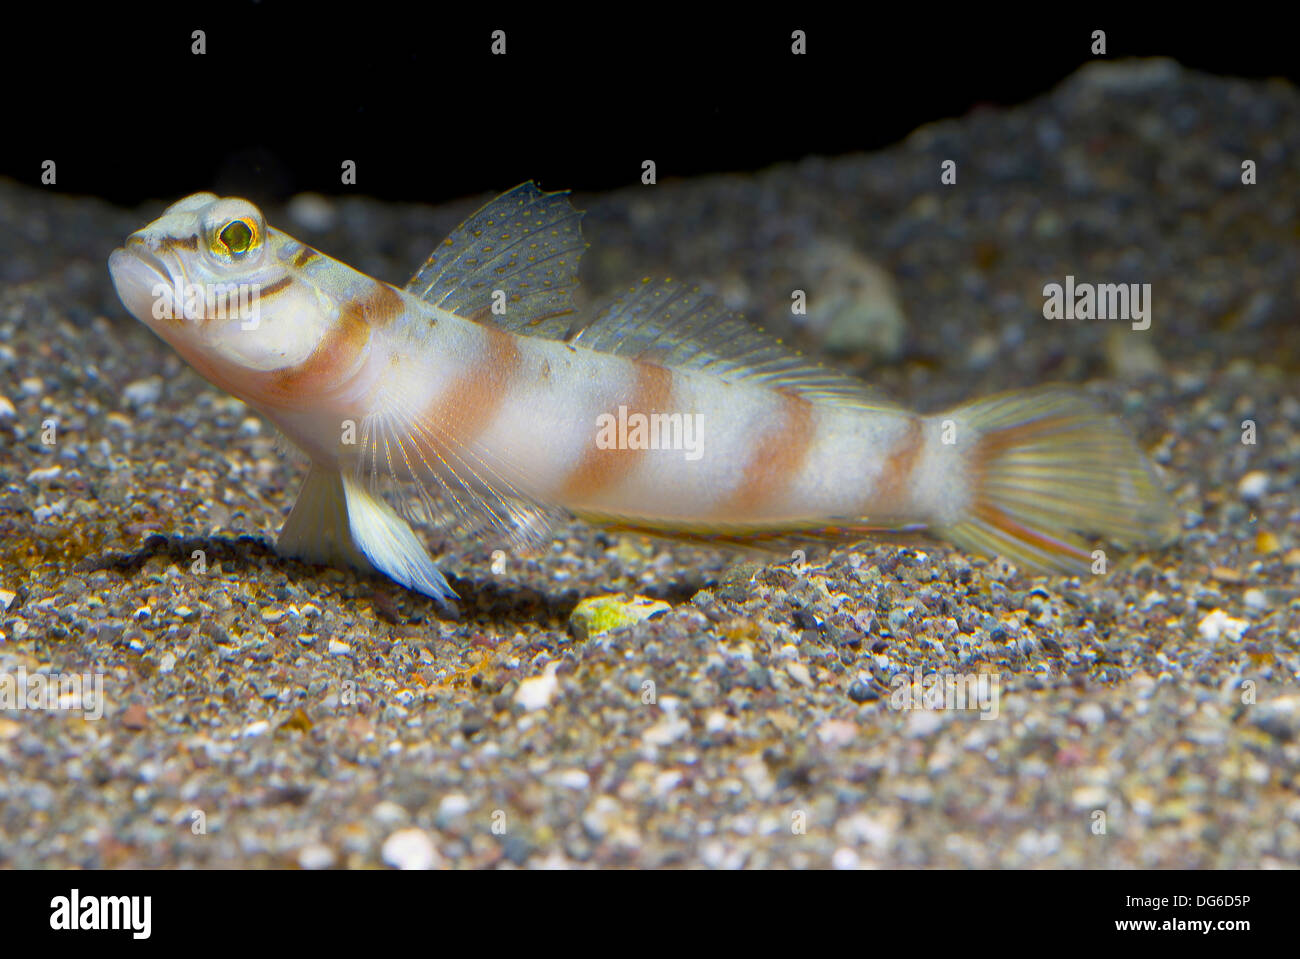 diagonal shrimp goby, amblyeleotris diagonalis - Stock Image